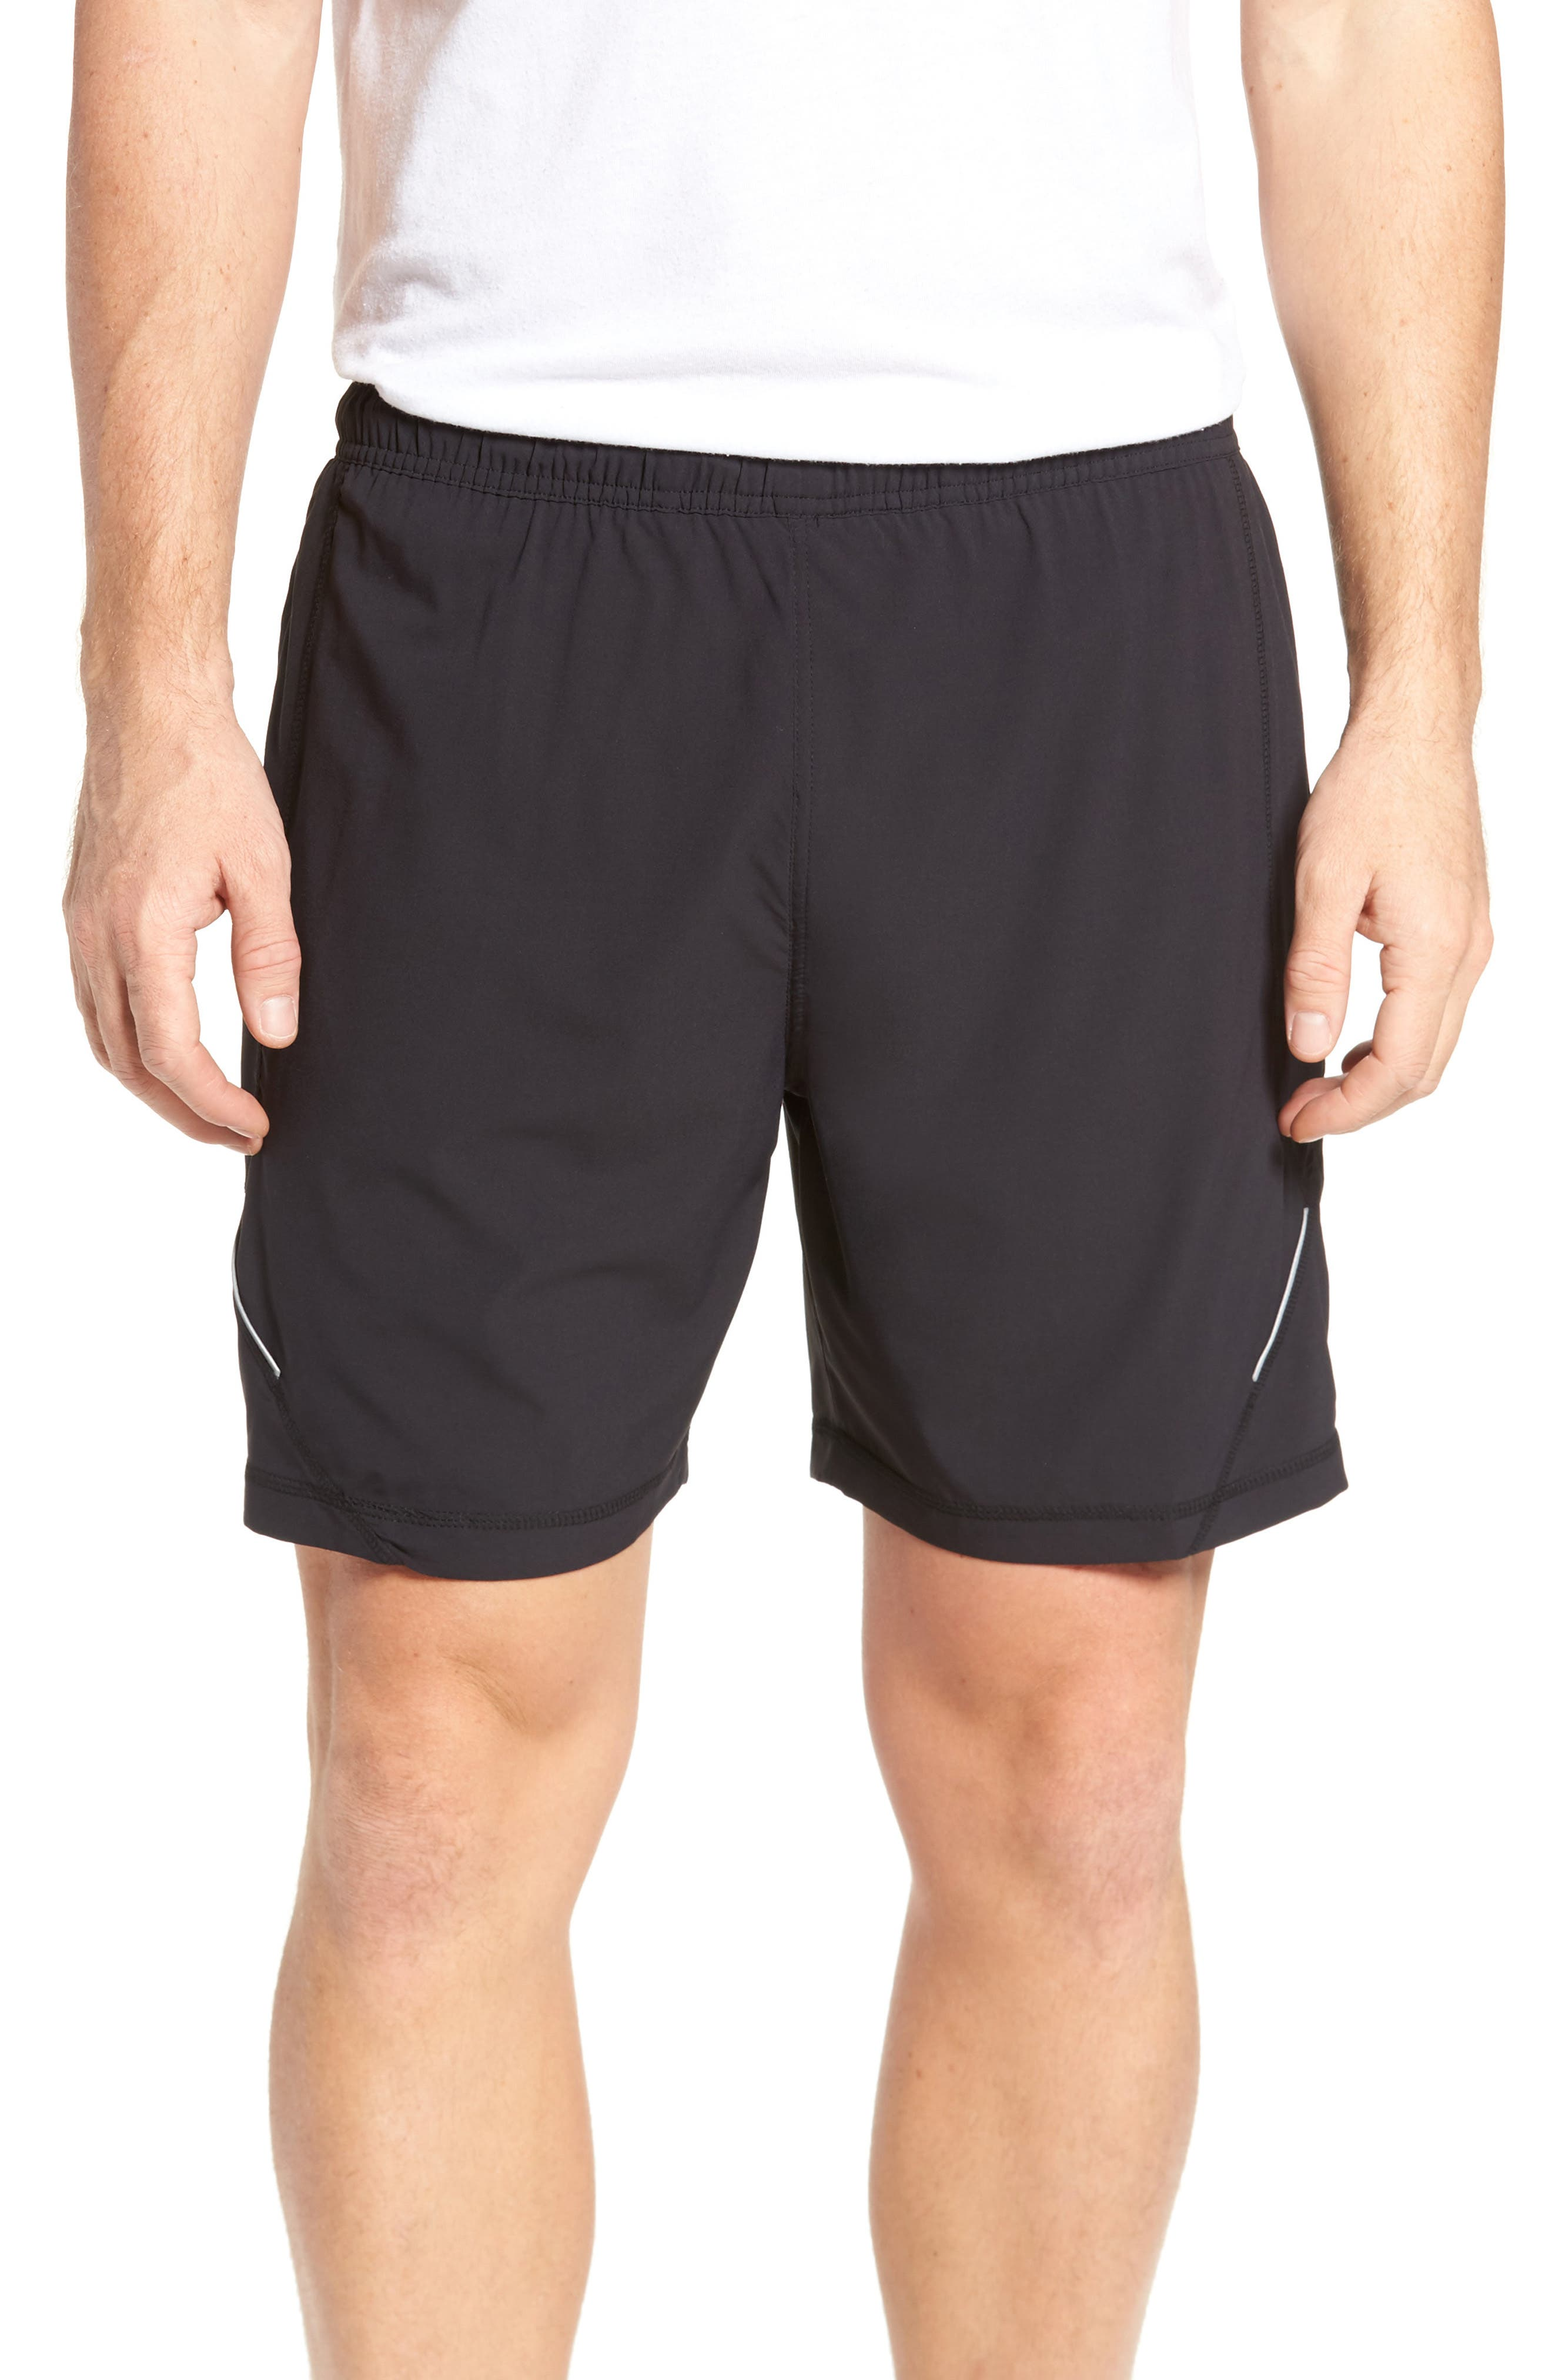 Men's Tasc Performance Propulsion Athletic Shorts